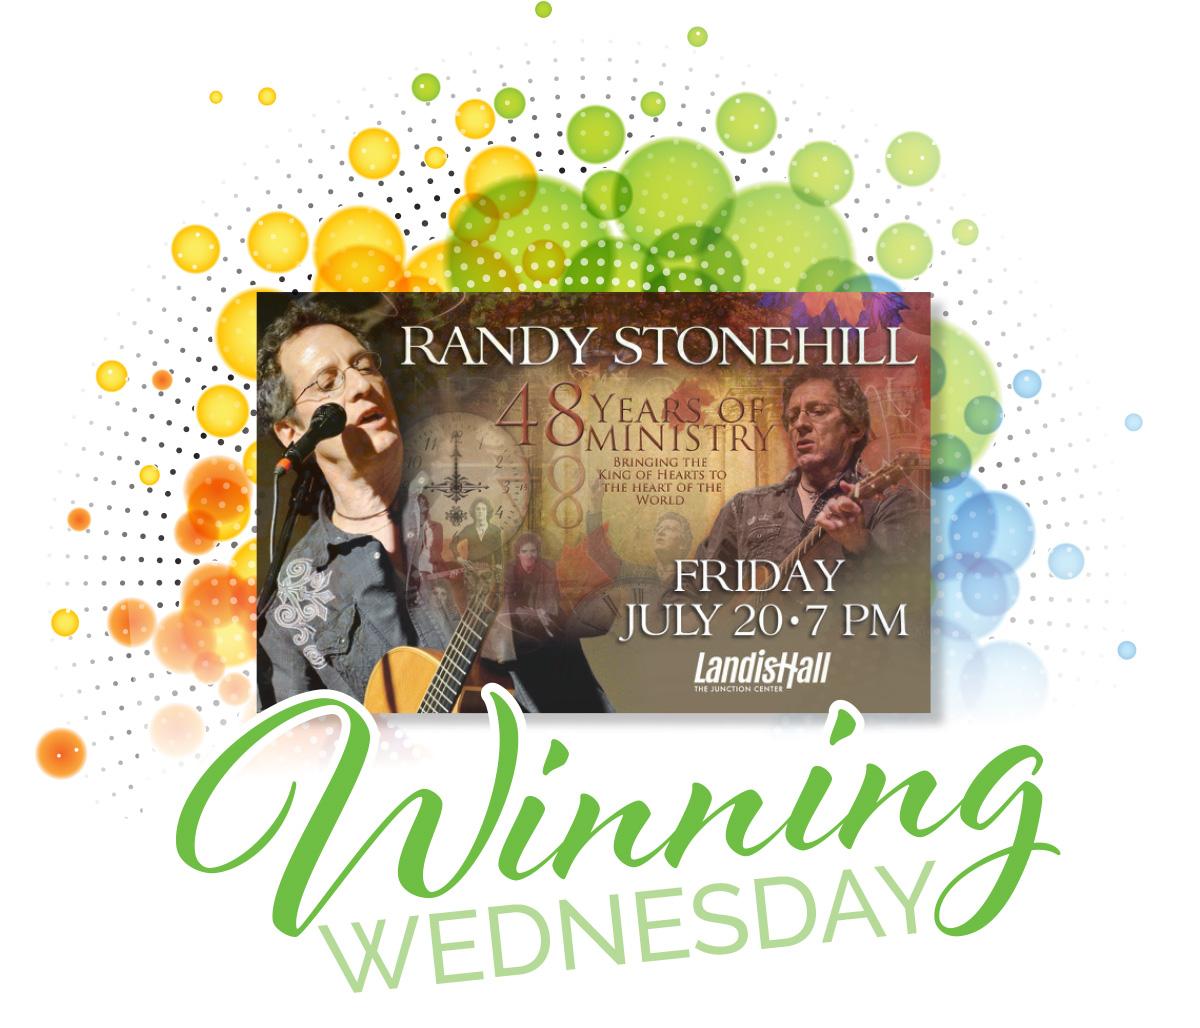 Randy Stonehill Winning Wednesday